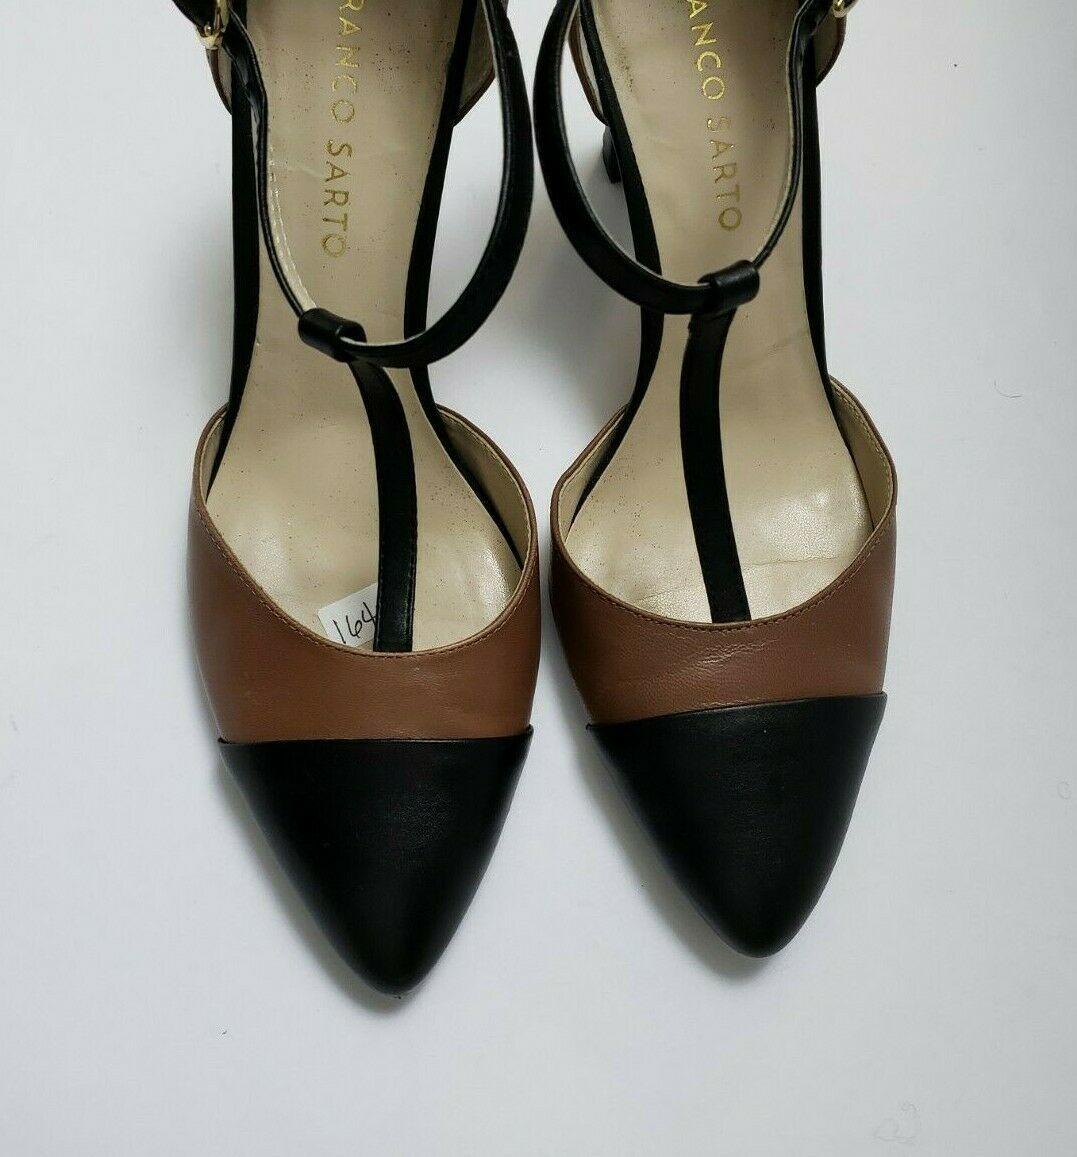 Franco Sarto Shoes Heels Brown Black T-Strap Tanda Womens Size 8.5 M image 7